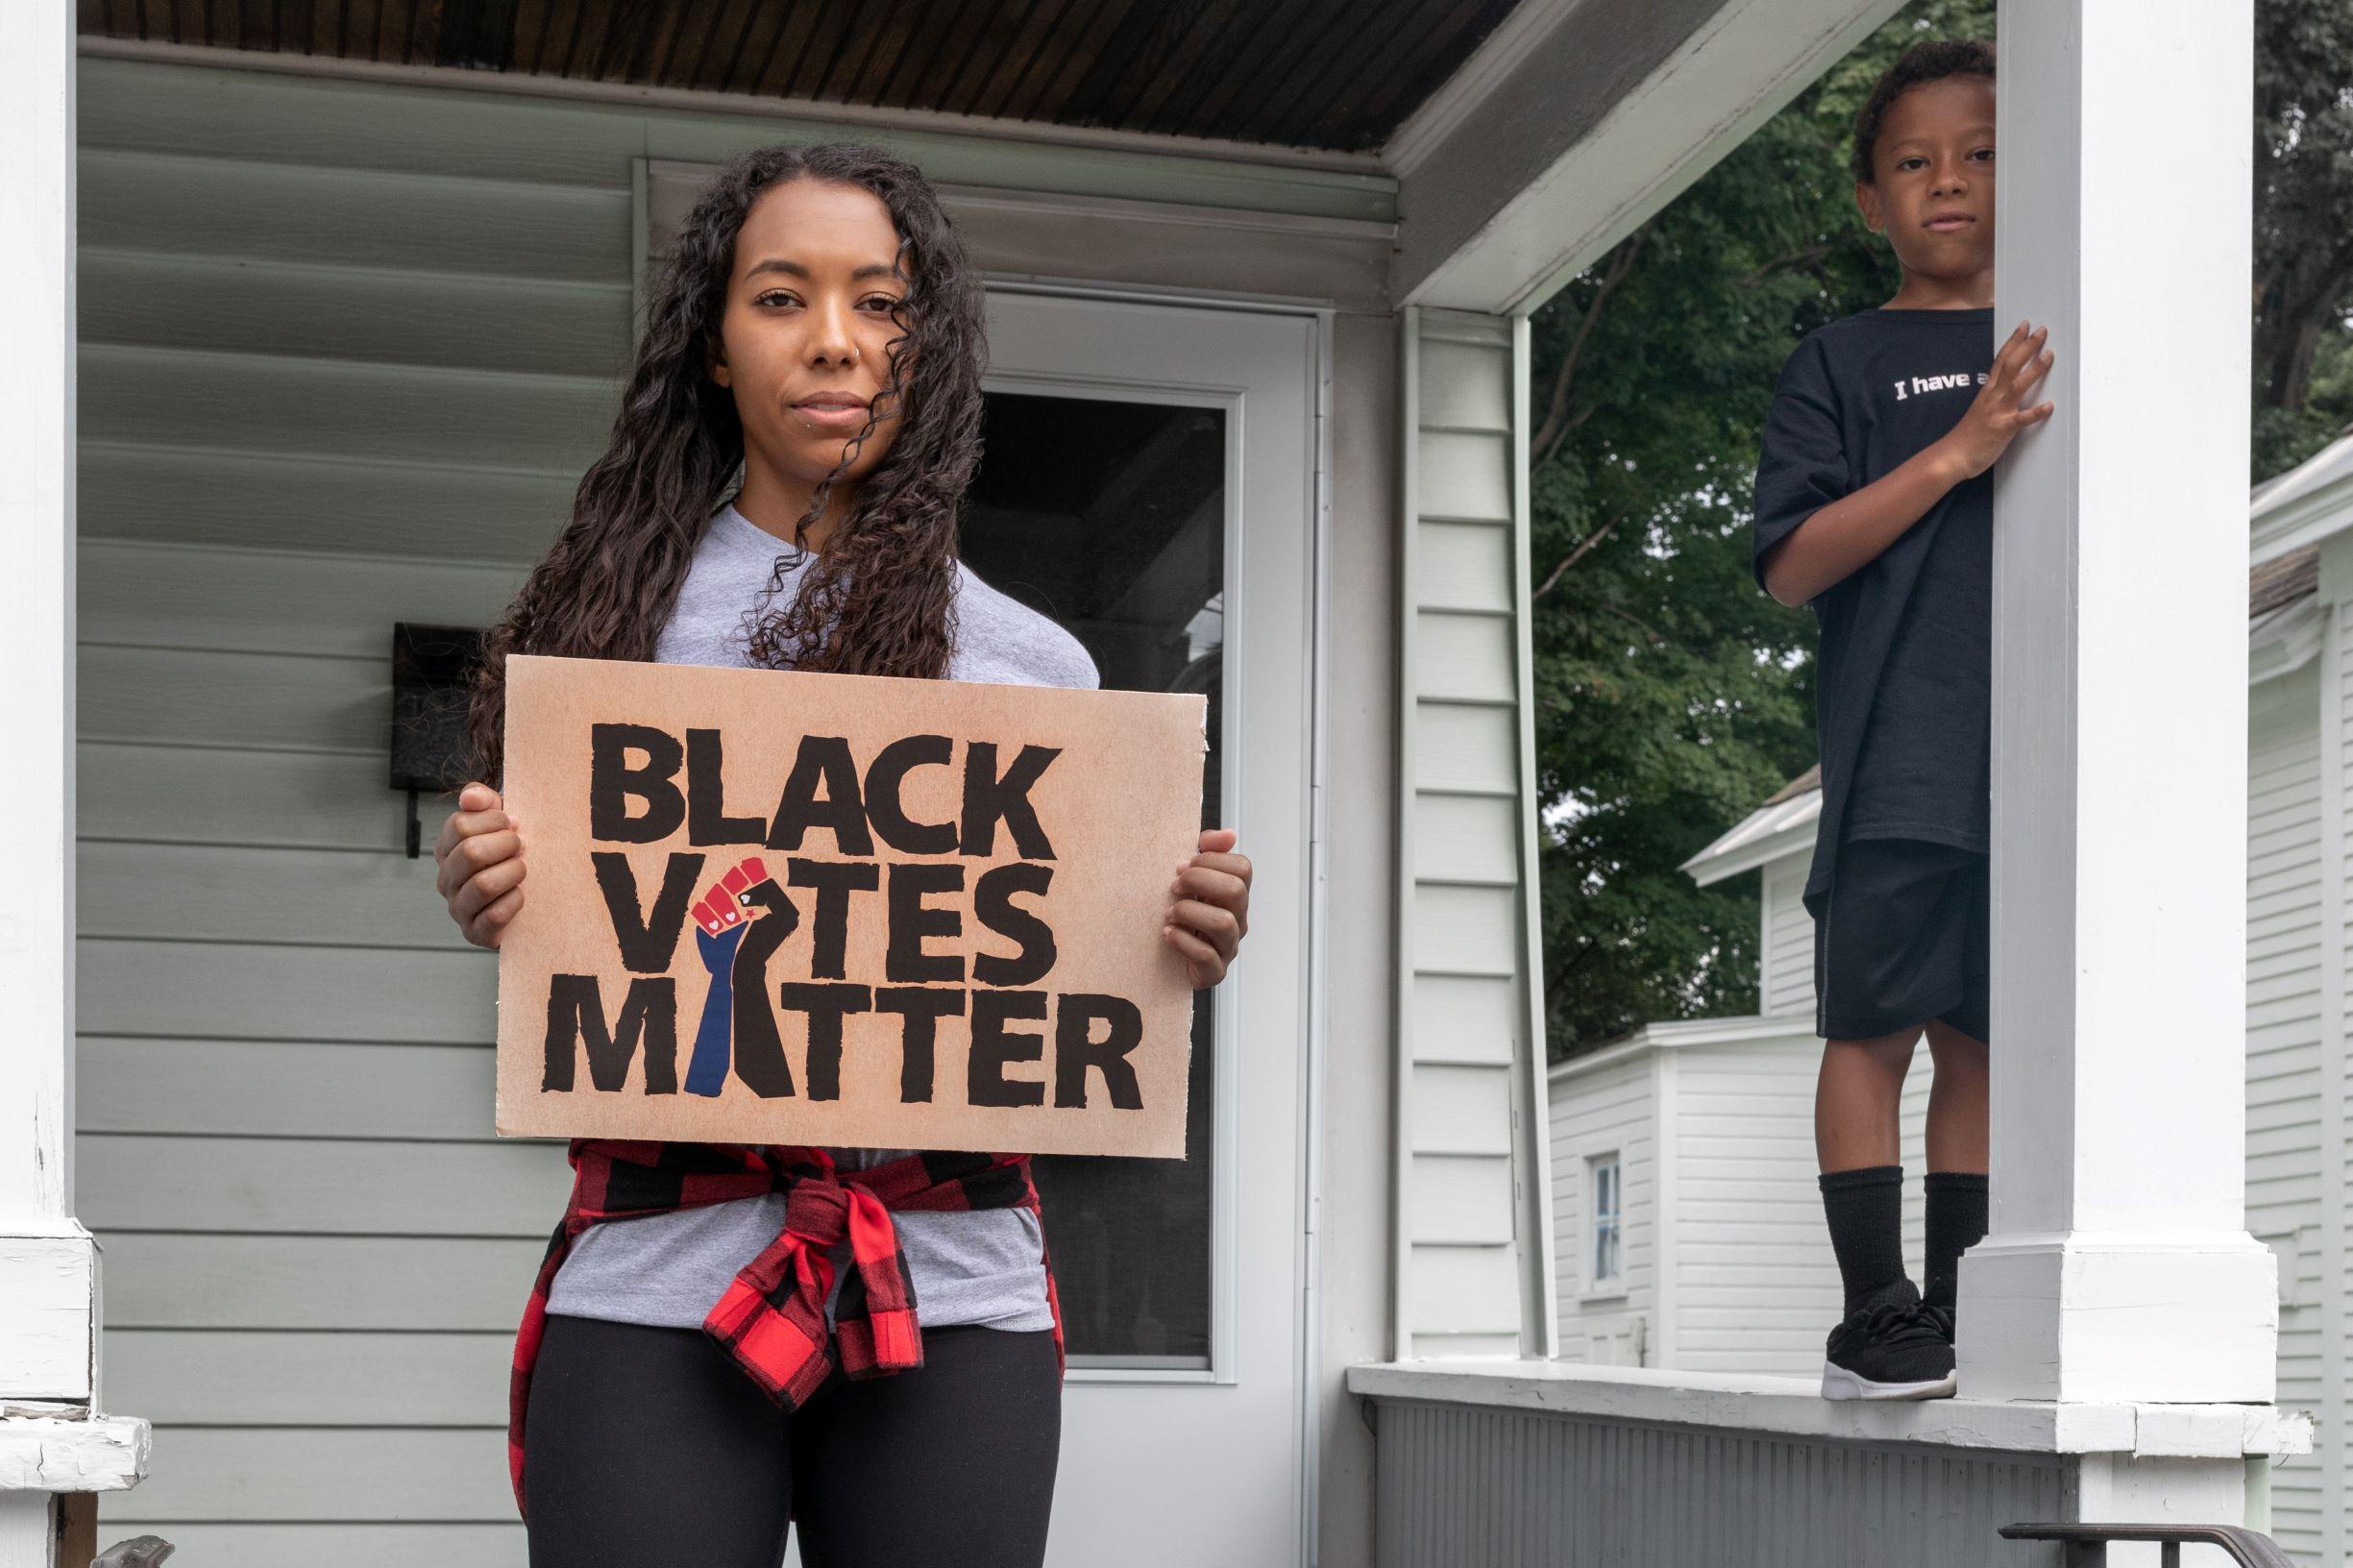 Black-votes-matter